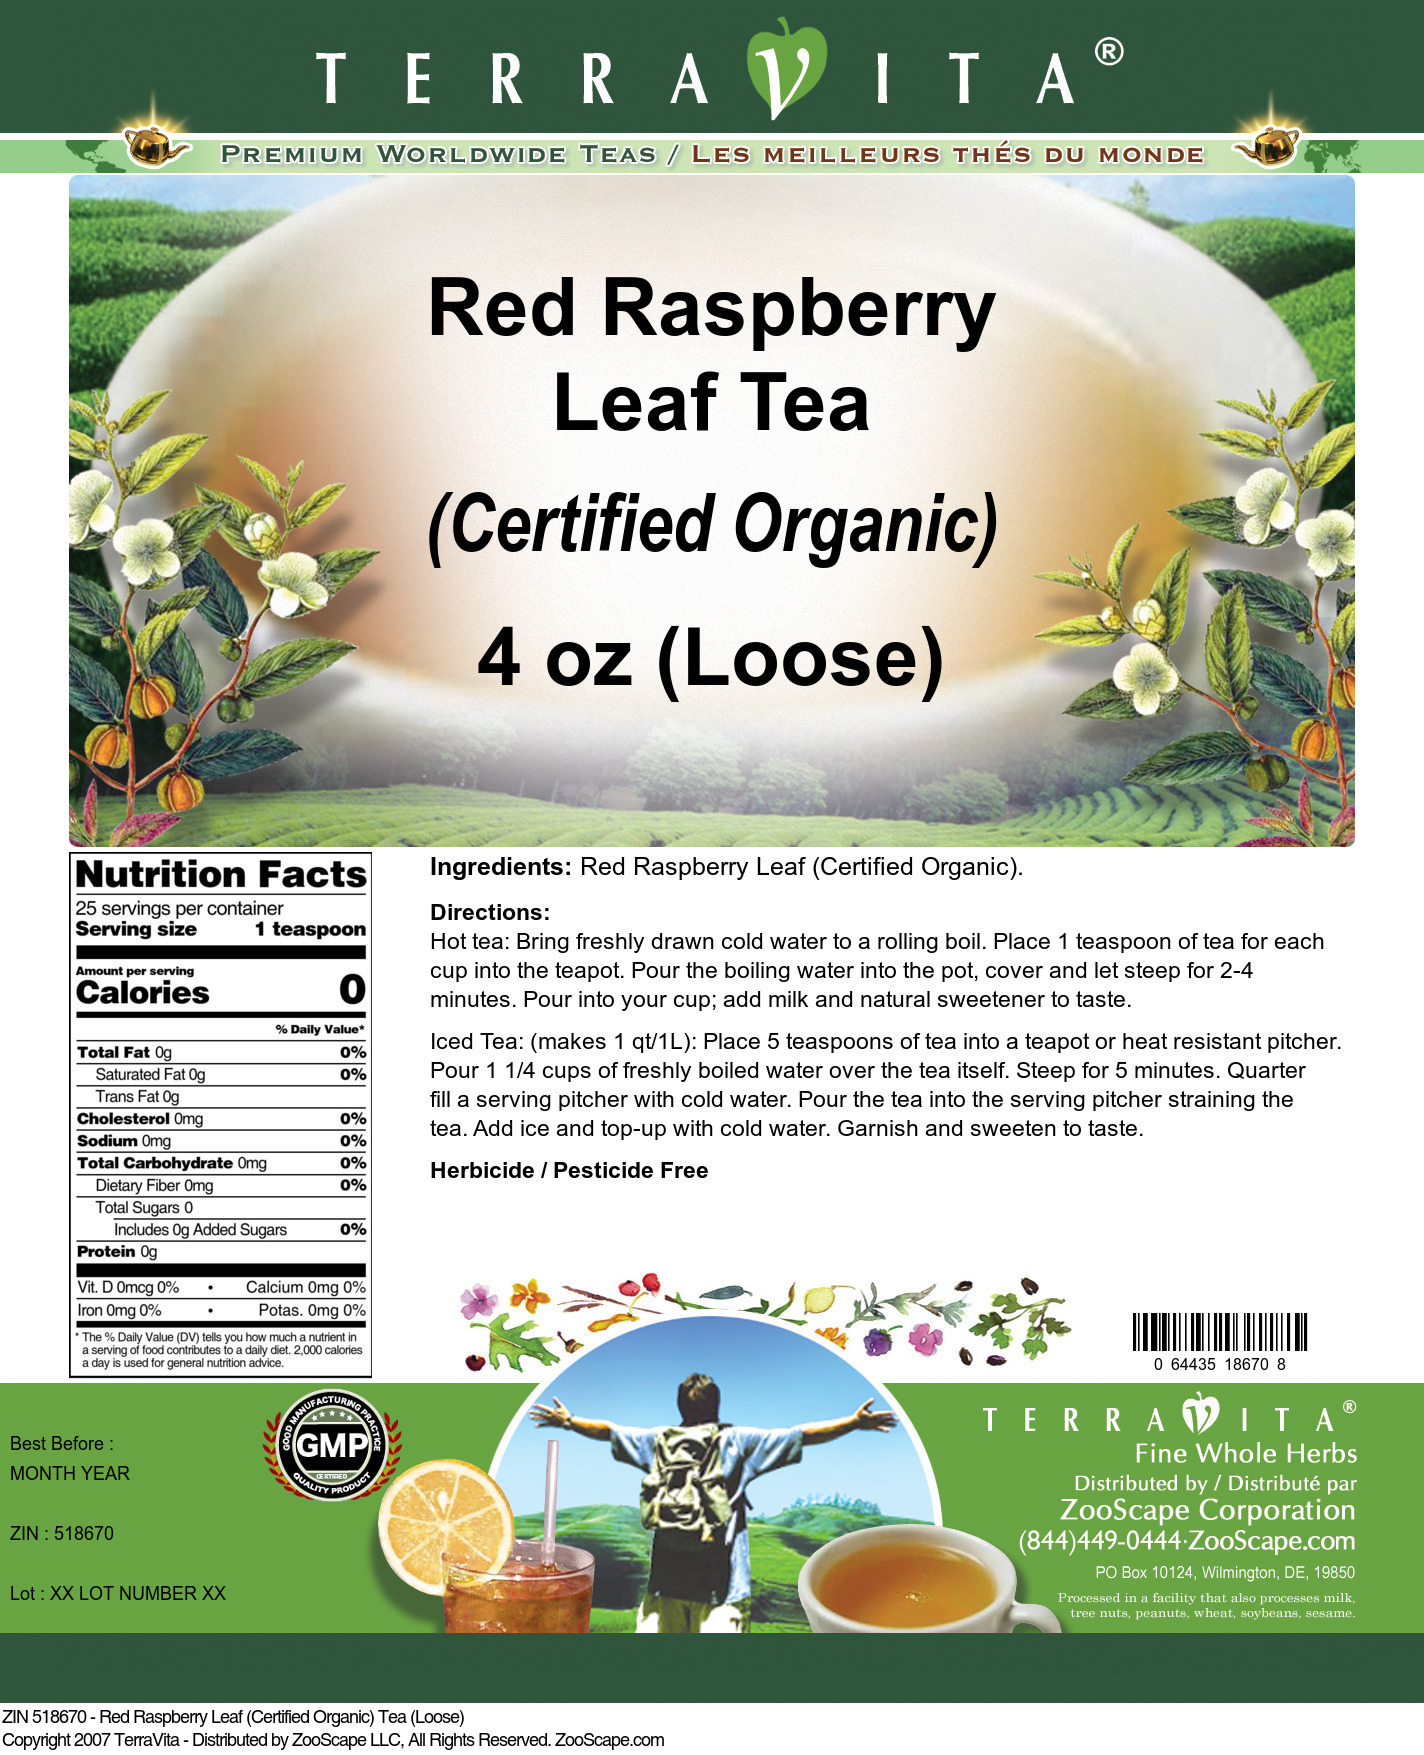 Red Raspberry Leaf (Certified Organic) Tea (Loose)